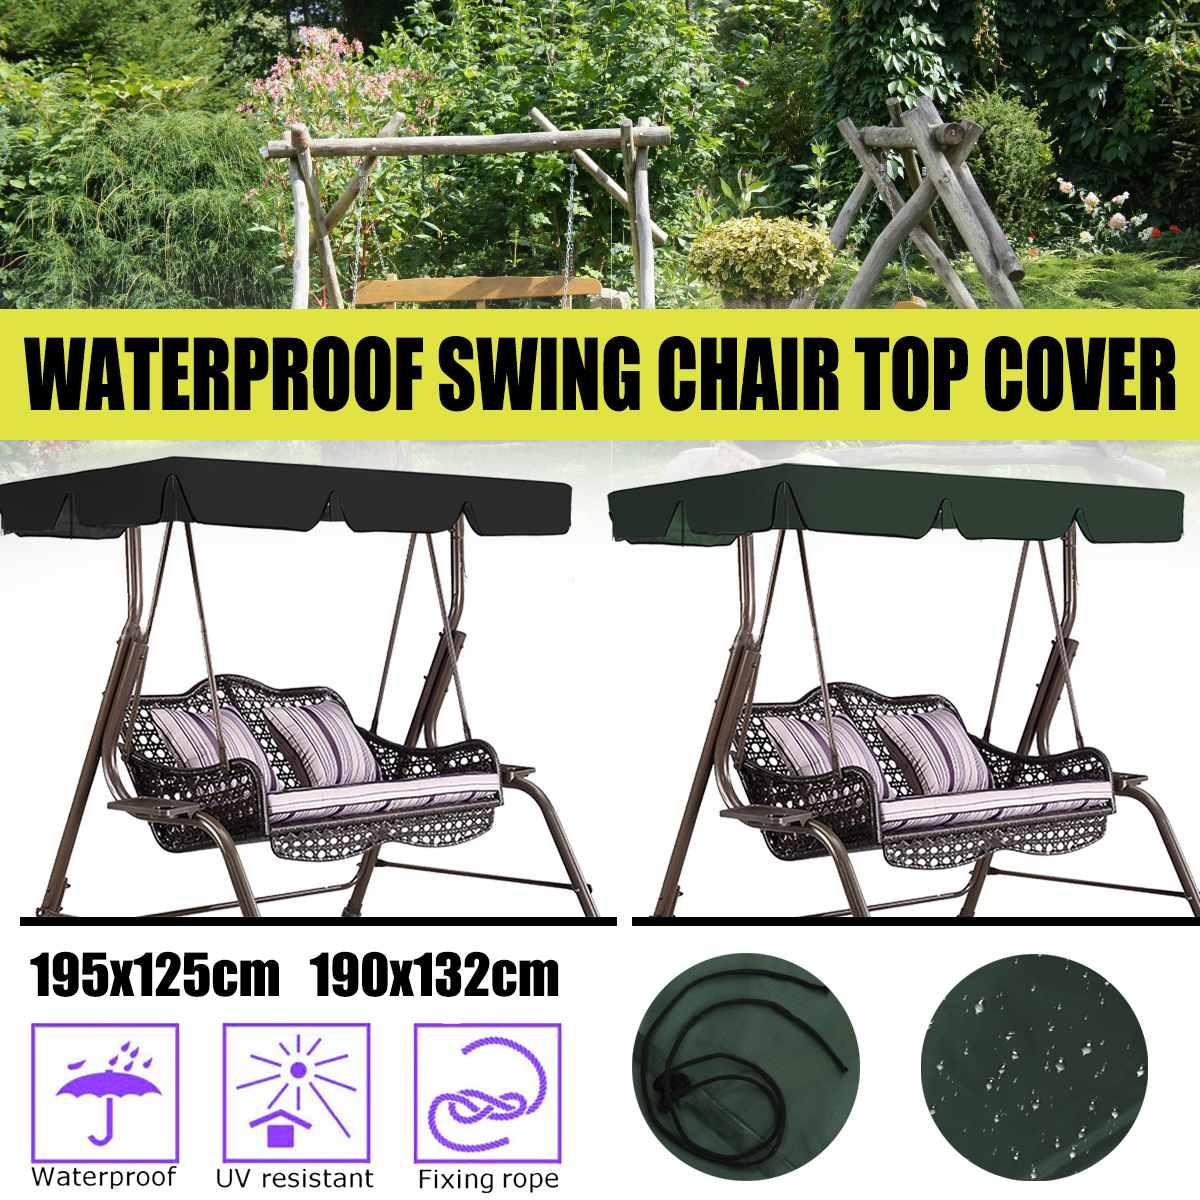 Waterproof 2 3 Seats Canopy Replacement Garden Courtyard Swing Cover